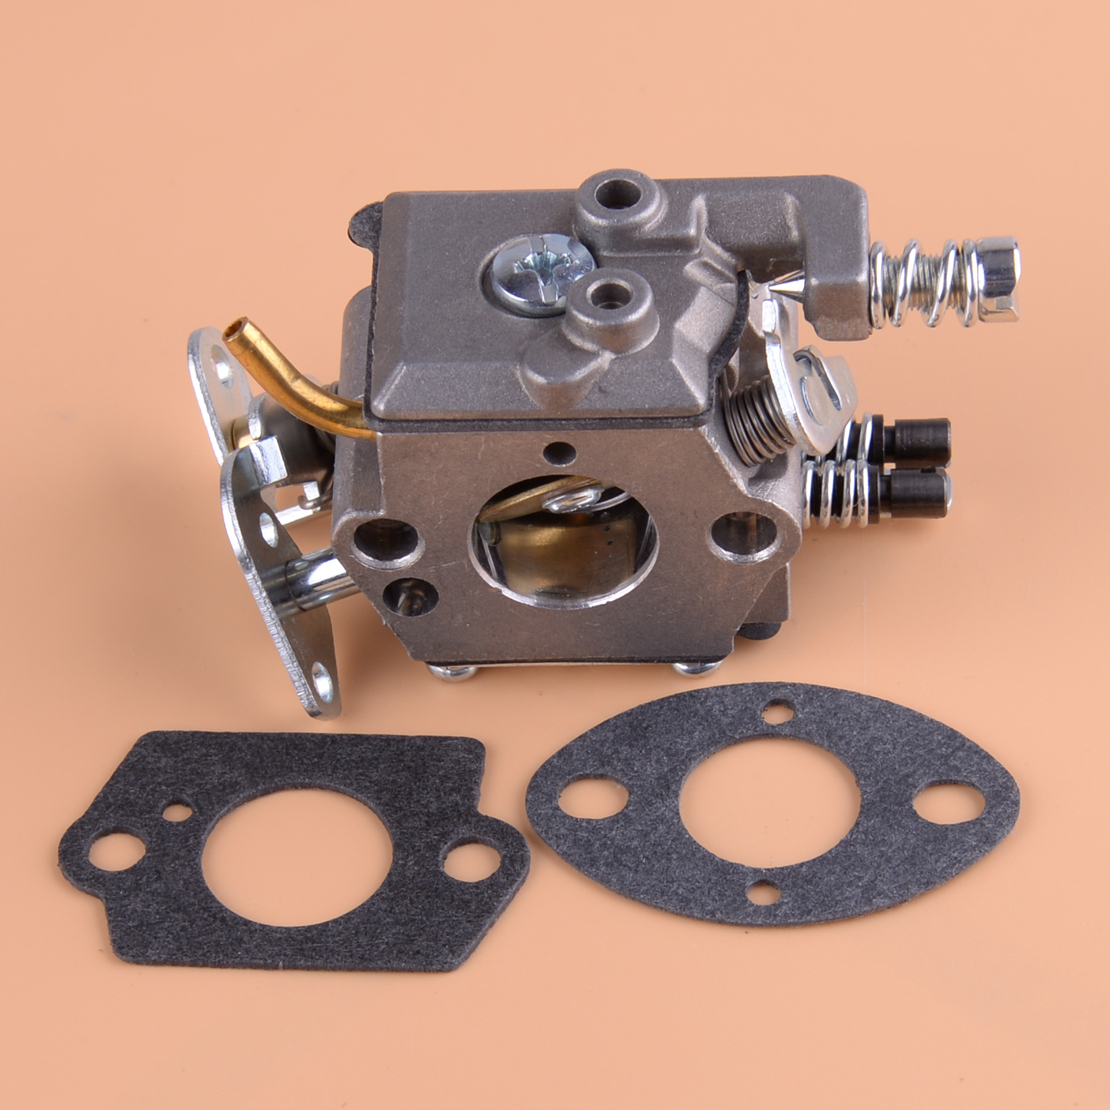 LETAOSK Carburateur Kit 530071987 530019172 530035482 Ajustement Pour Husqvarna 36 41 136 137 137e 141 142 Tronçonneuse Zama C1Q-W29E